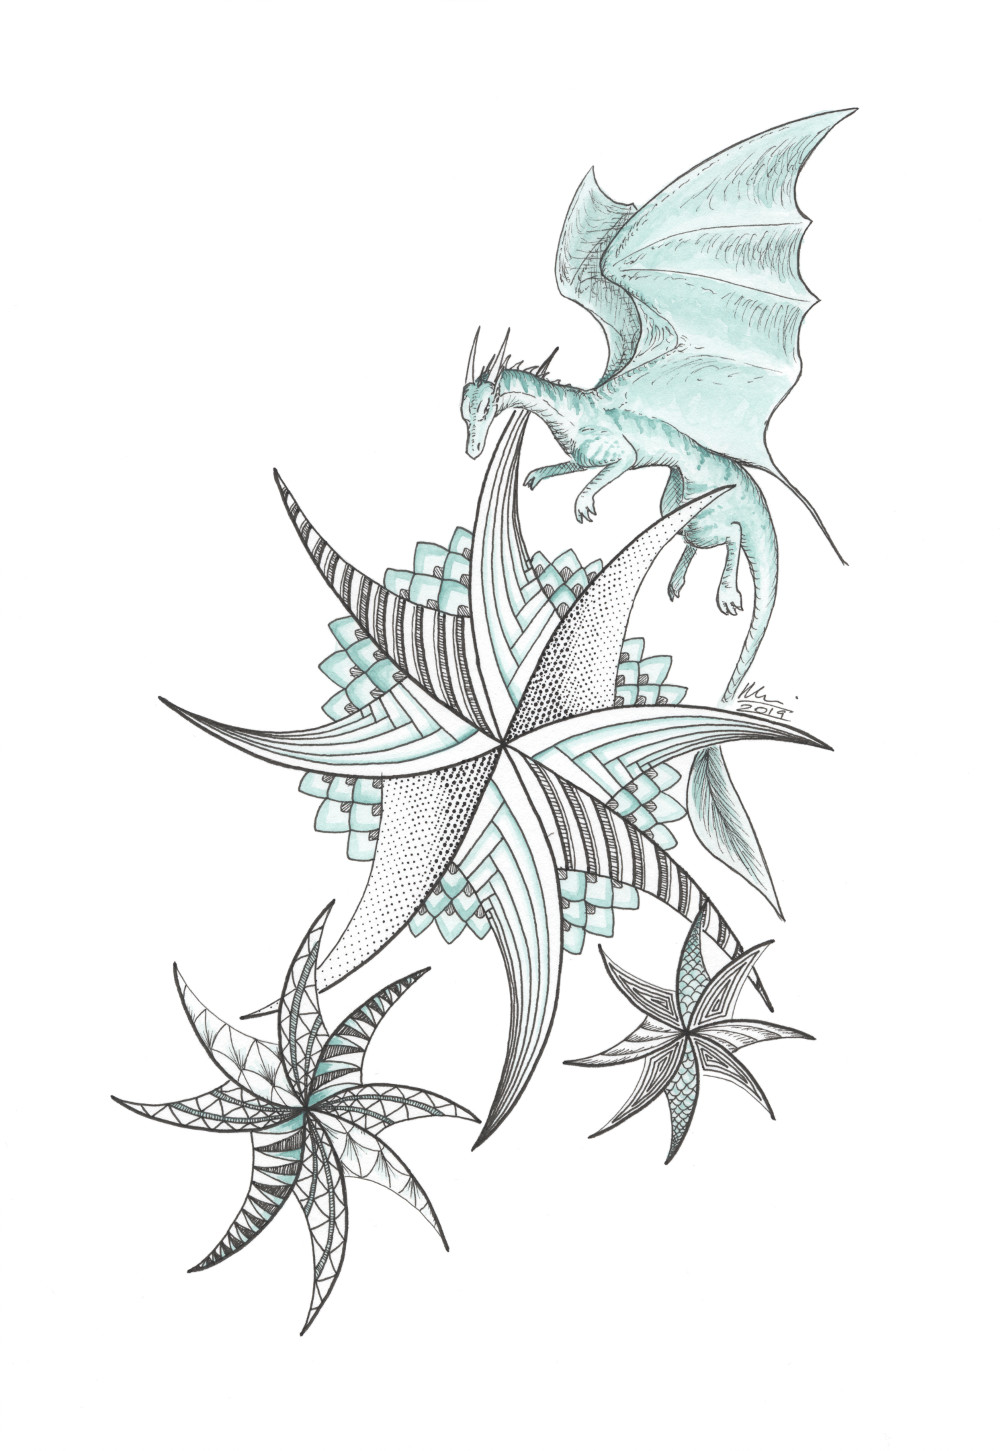 Dizzy pinwheels in green